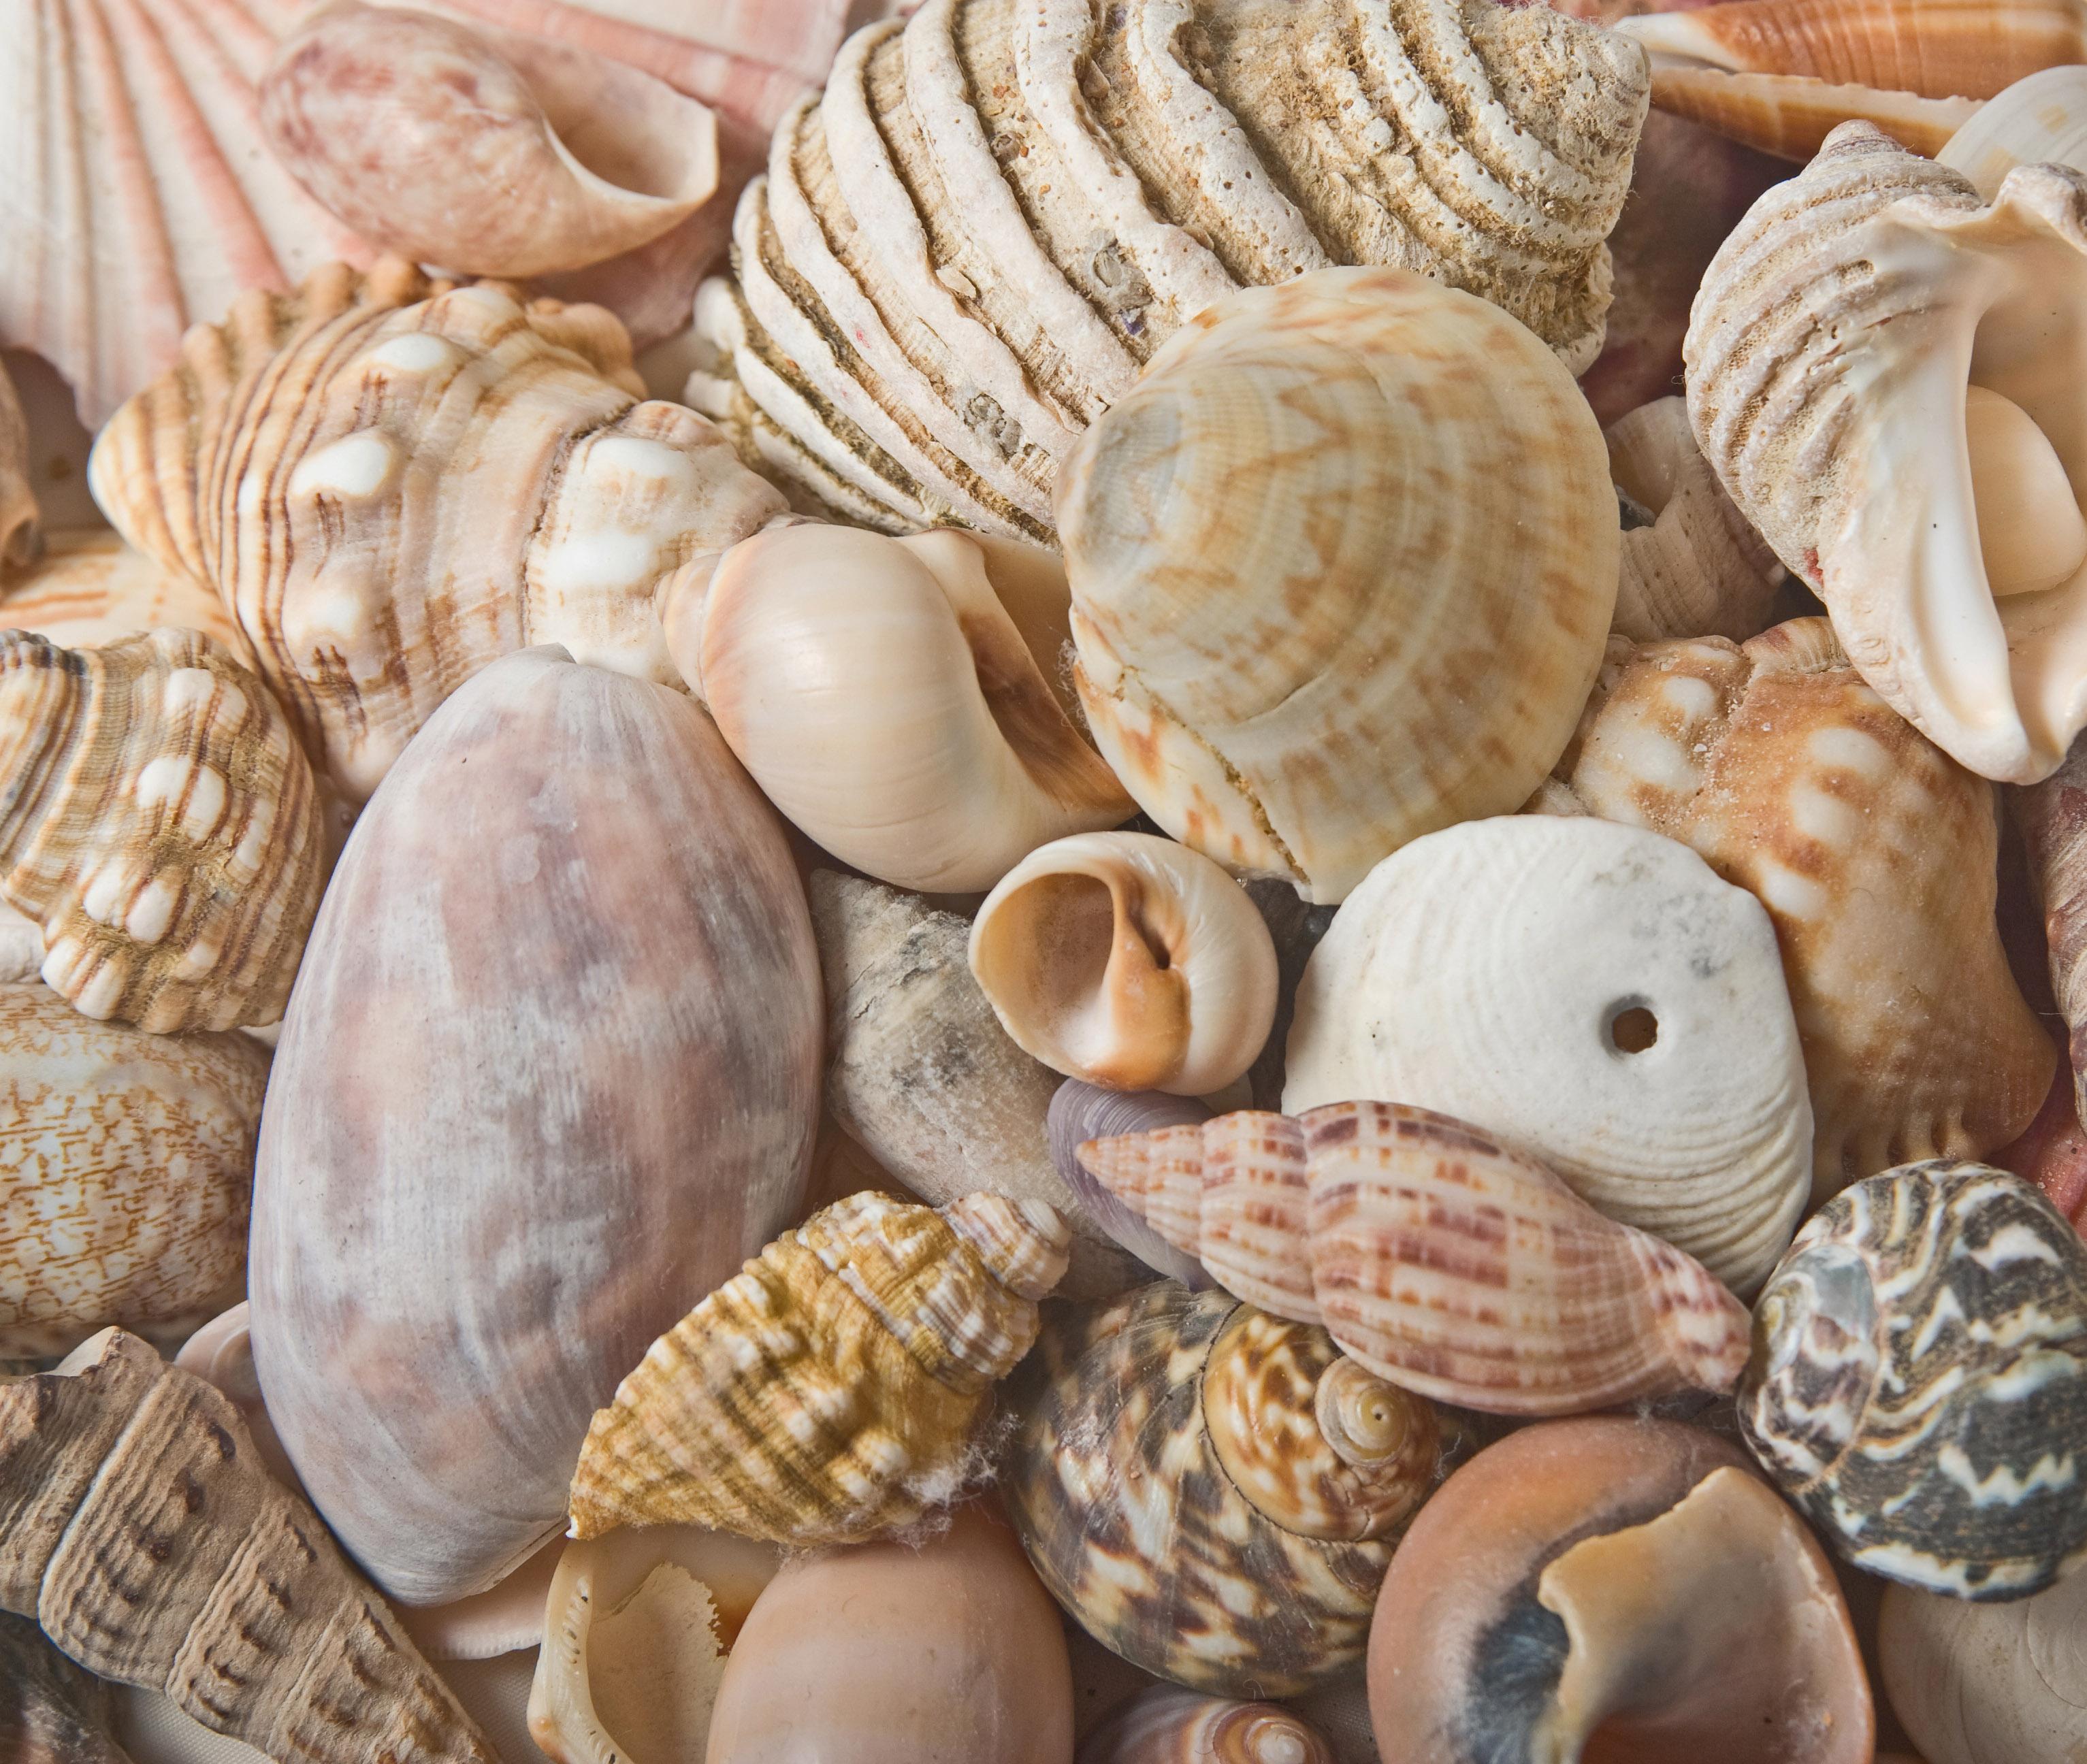 Seashells Background Image Www Myfreetextures Com Free